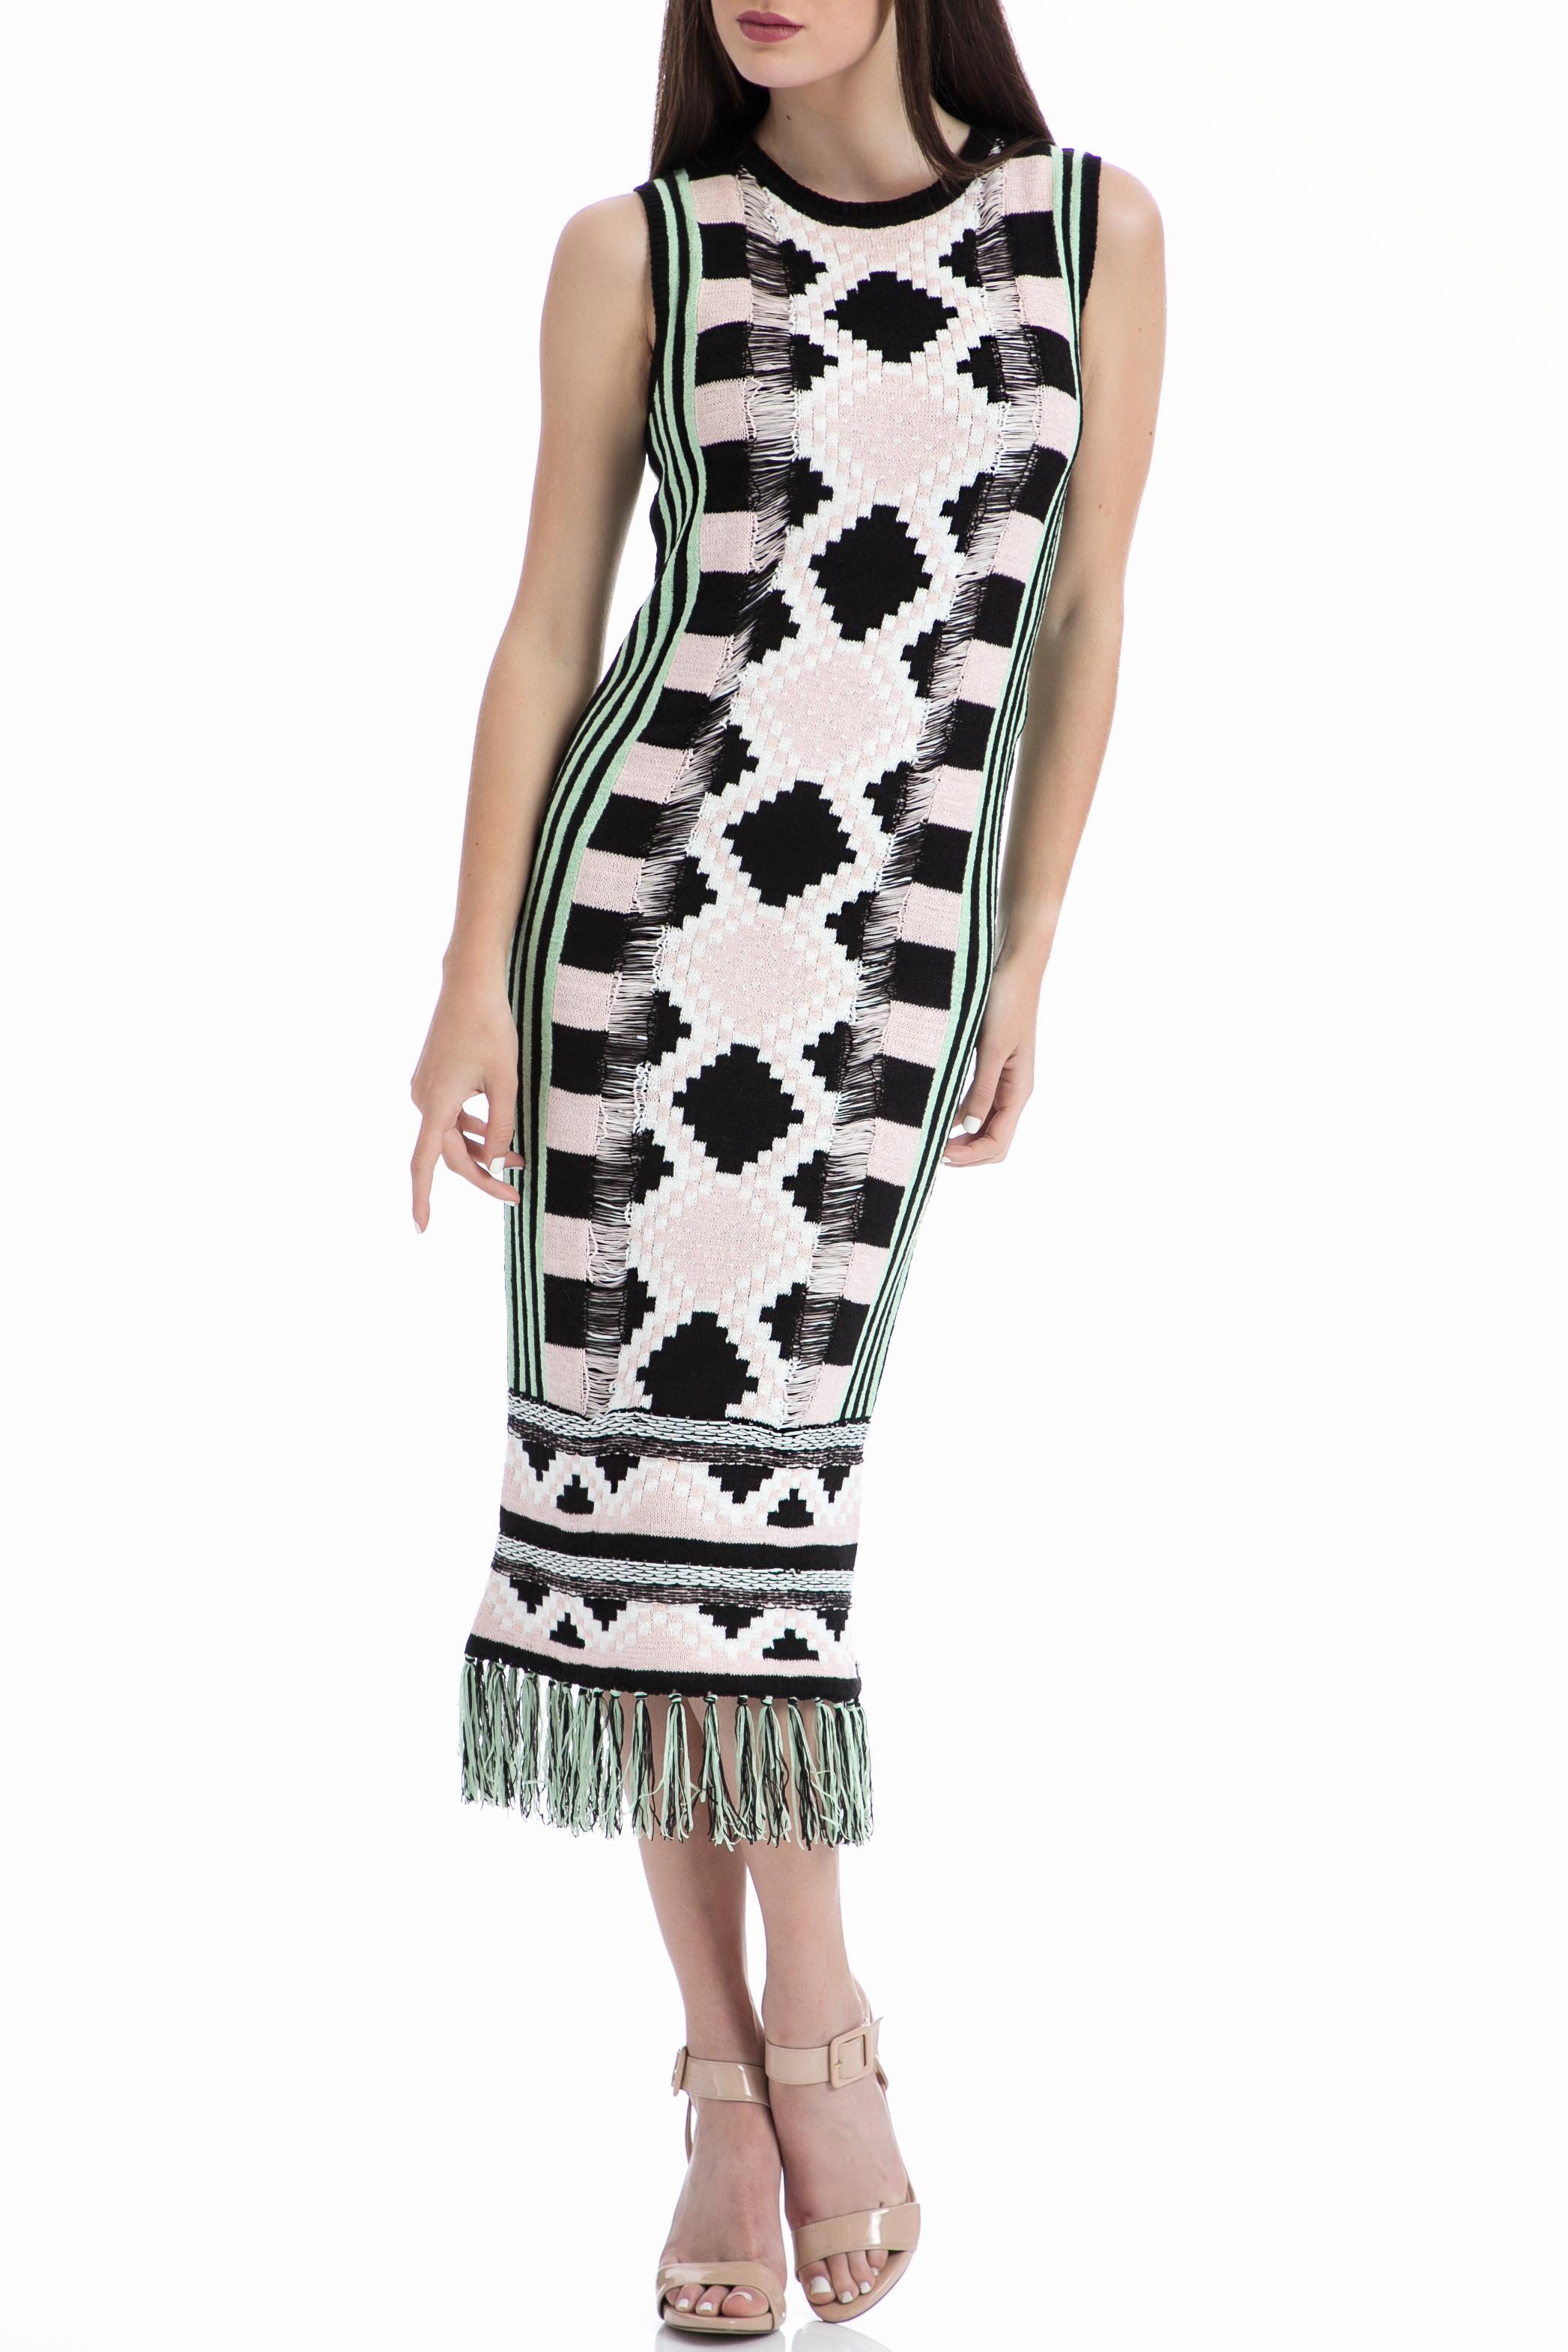 MAISON SCOTCH - Φόρεμα Maison Scotch εκρού-μαύρο γυναικεία ρούχα φορέματα μέχρι το γόνατο